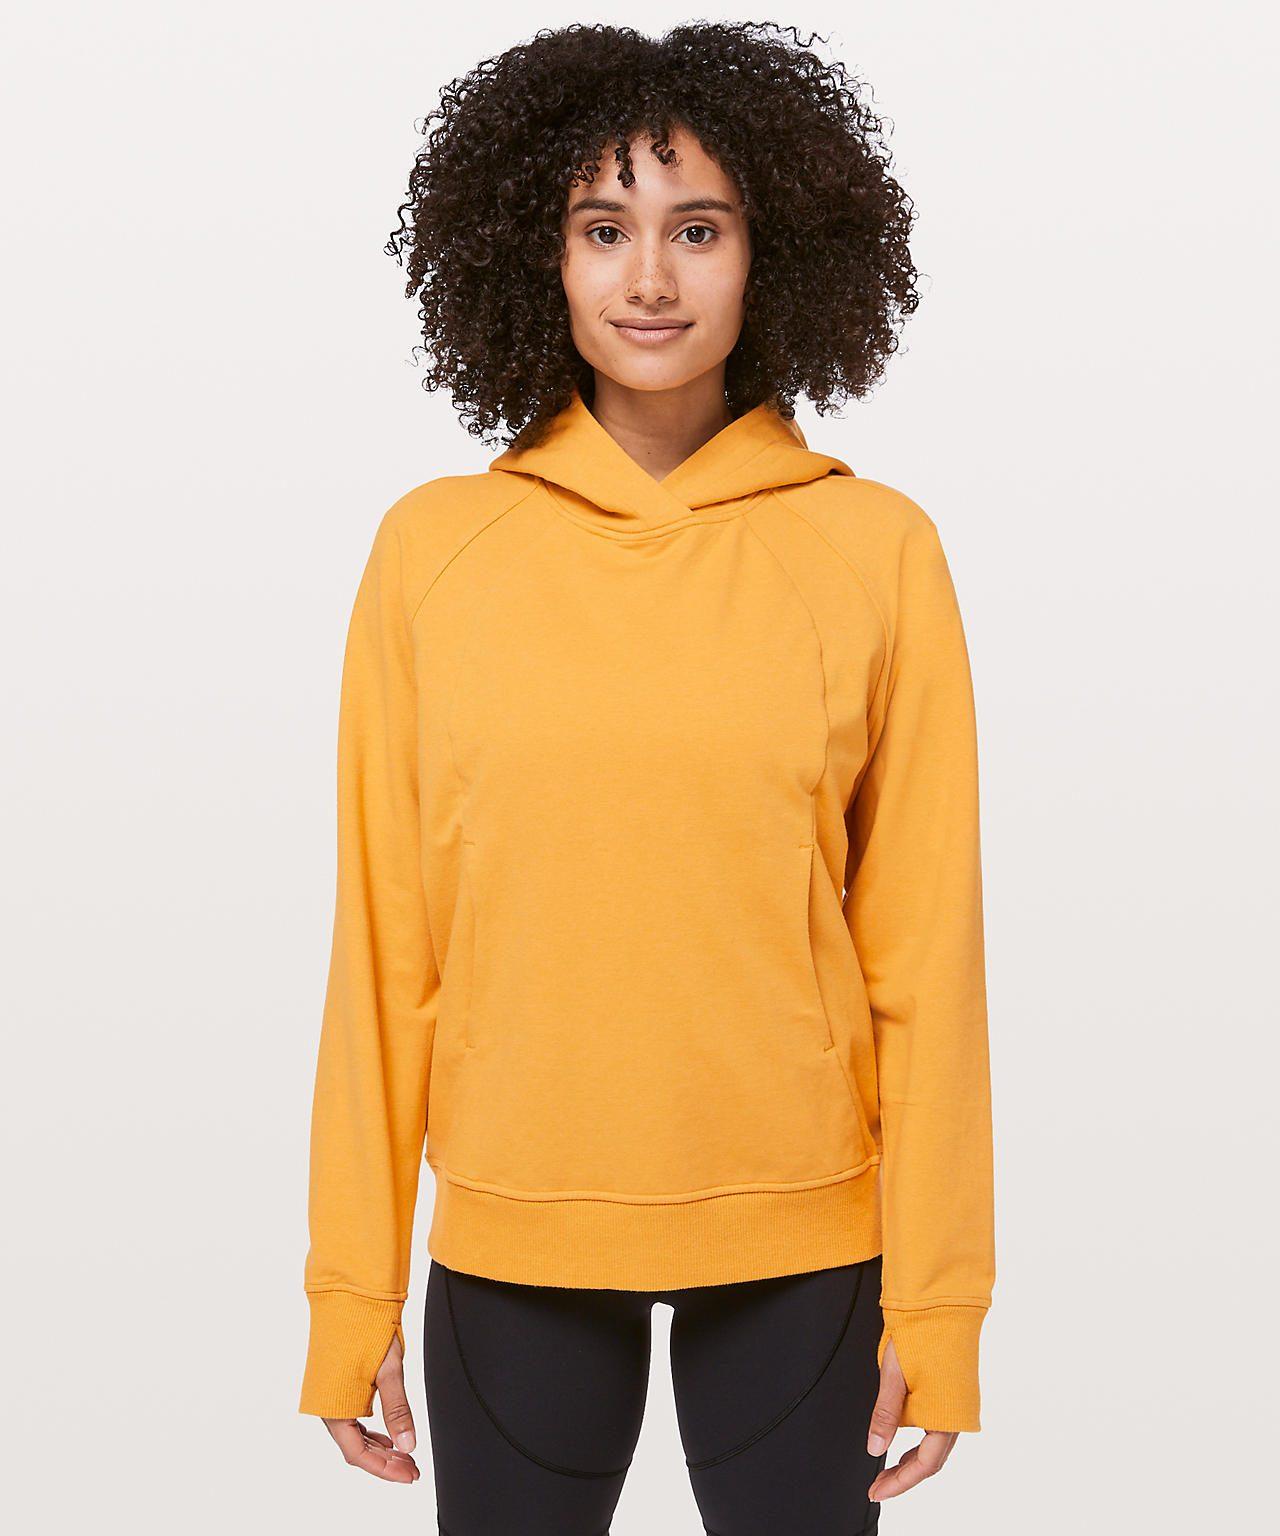 Scuba Pullover Heathered Honey Lemon